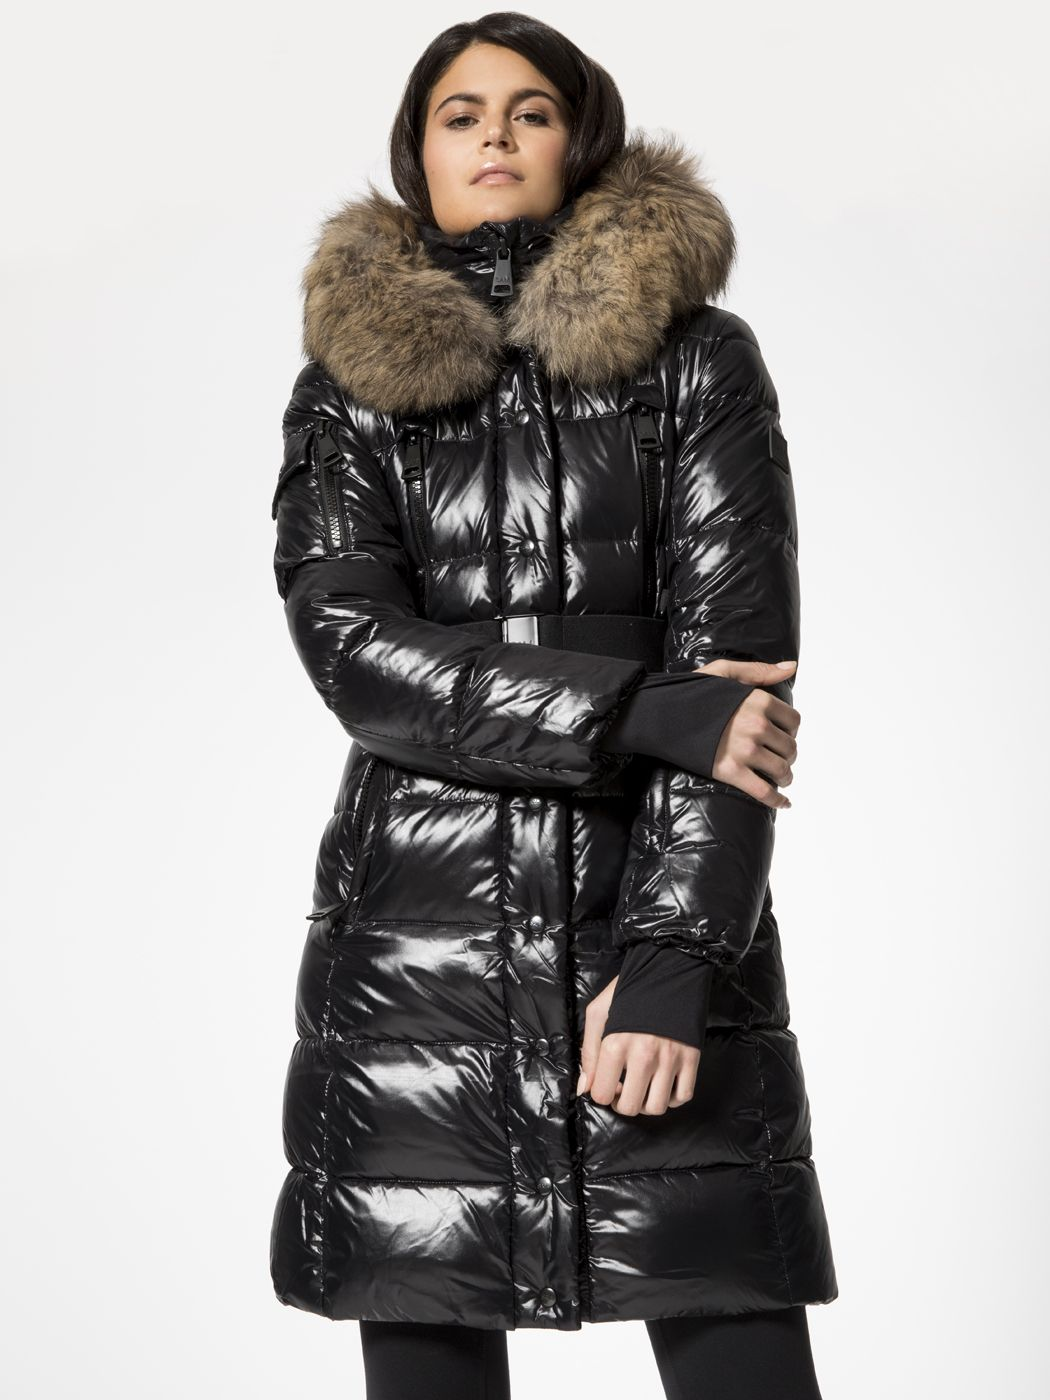 Infinity Jacket In Jet By Sam From Carbon38 Shiny Jacket Winter Jackets Puffer Jacket Women [ 1400 x 1050 Pixel ]